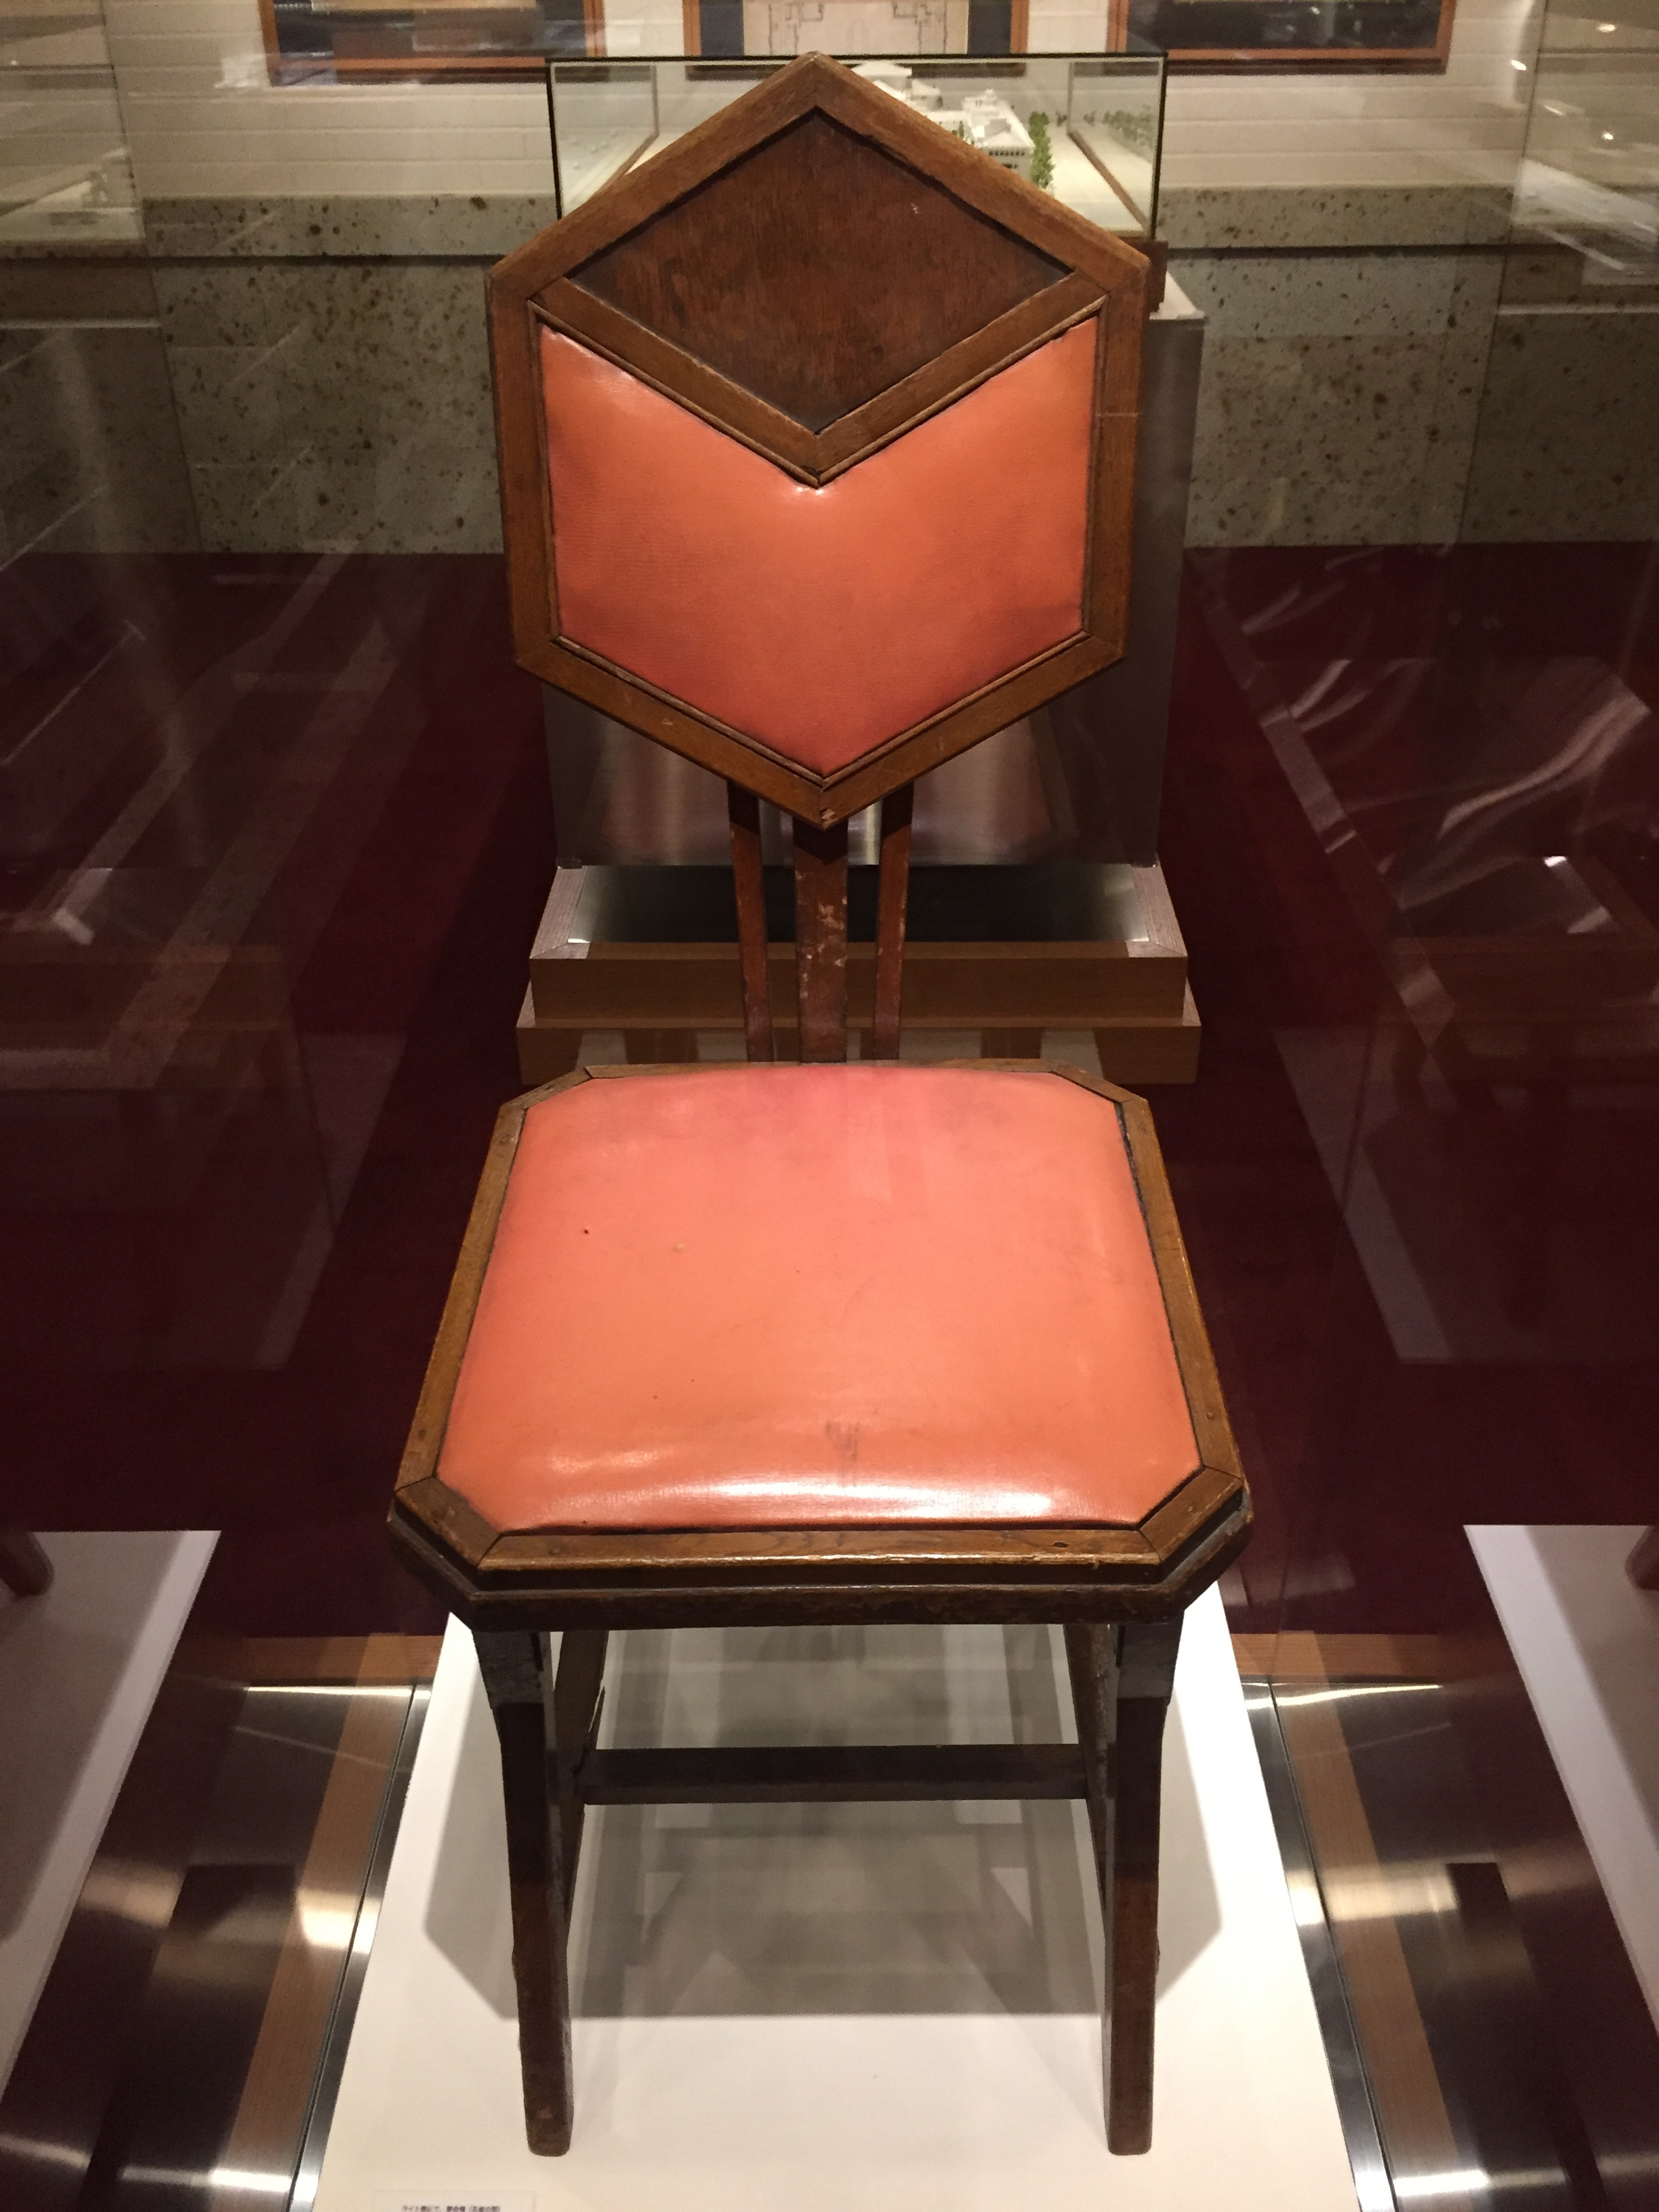 Imperial Hotel, chair designed by Frank Lloyd Wright)